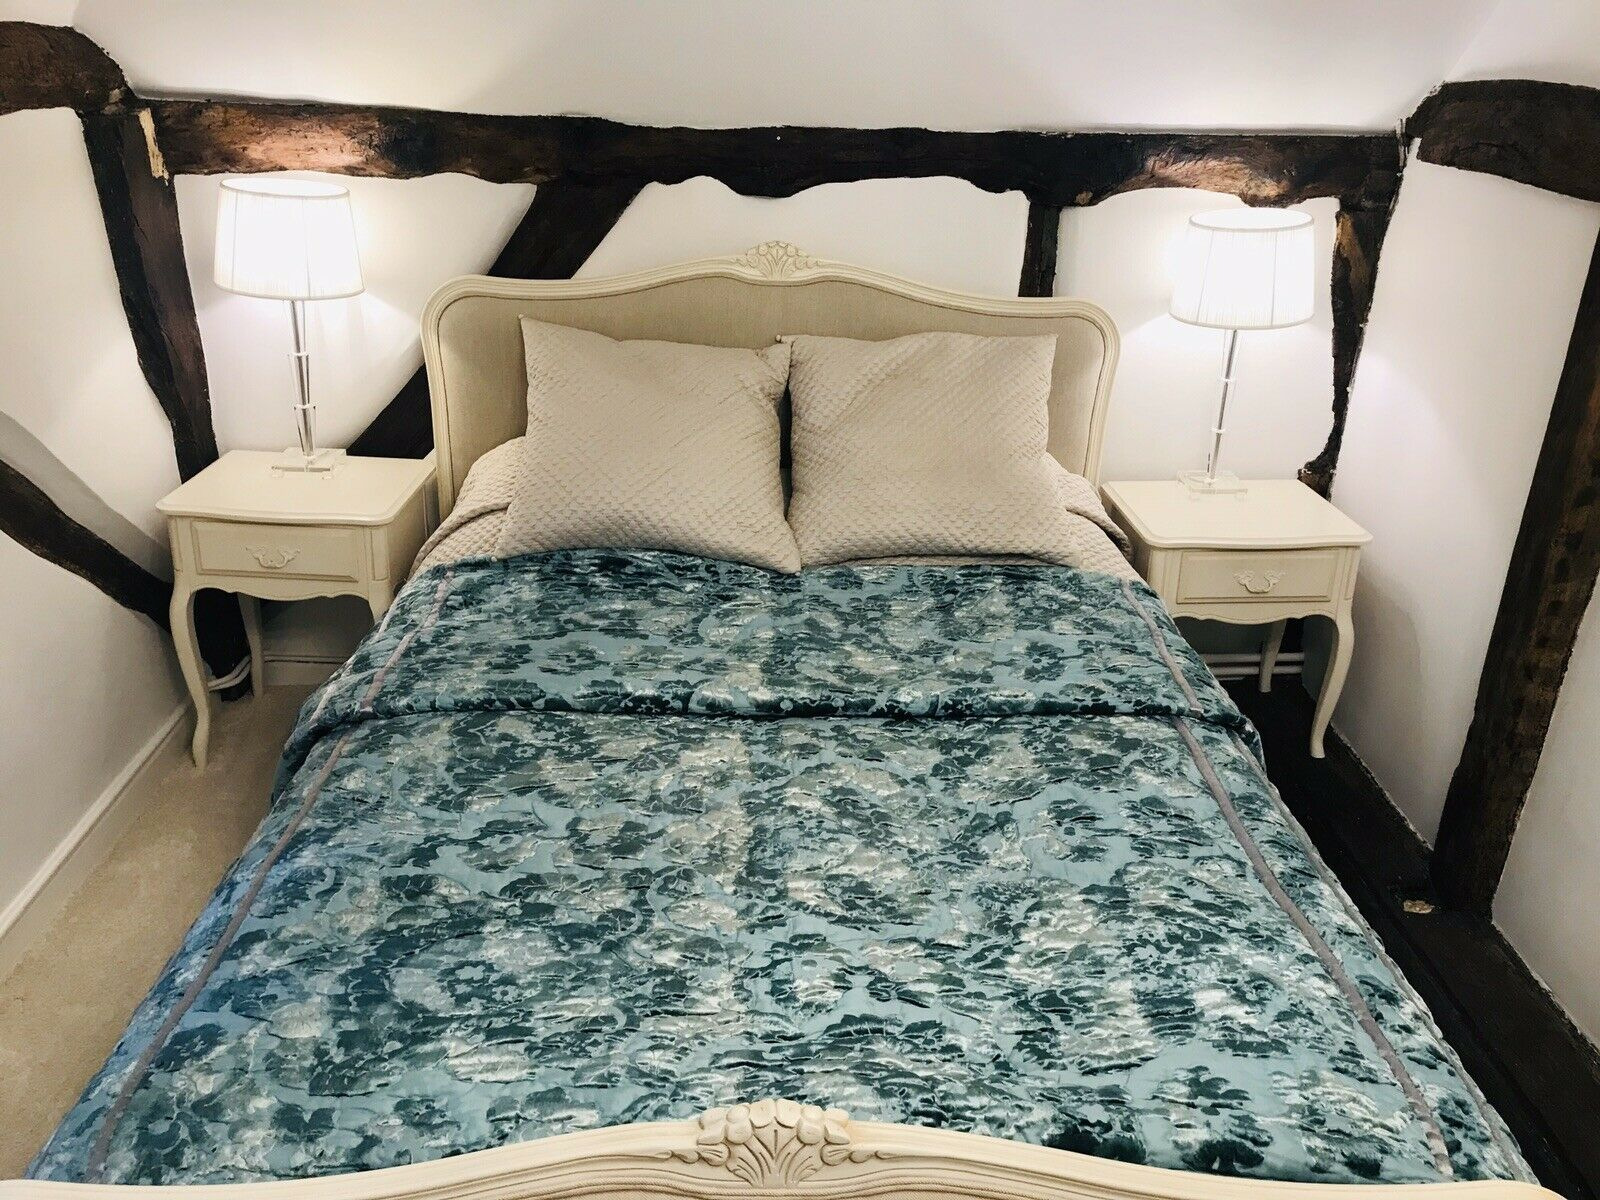 "Laura Ashley Teal Turquoise Blau Grün Bedspread Quilt Throw -92x216"" Velvet Mix"